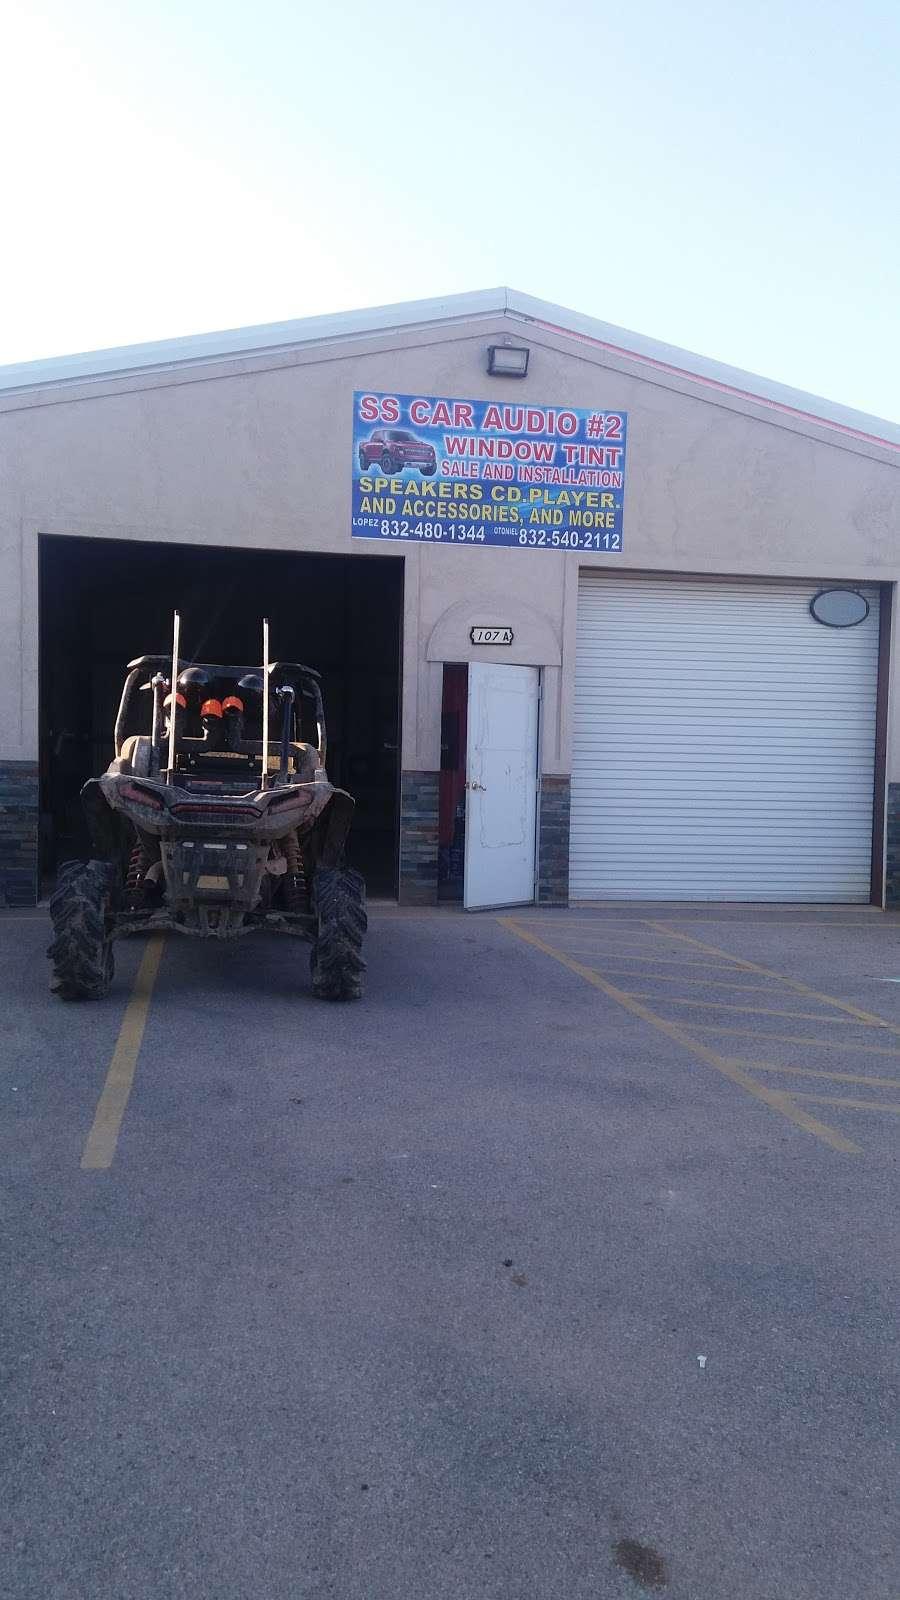 S.S. Car Audio 2 - store  | Photo 7 of 8 | Address: 107 E Marlin St, Willis, TX 77378, USA | Phone: (832) 480-1344